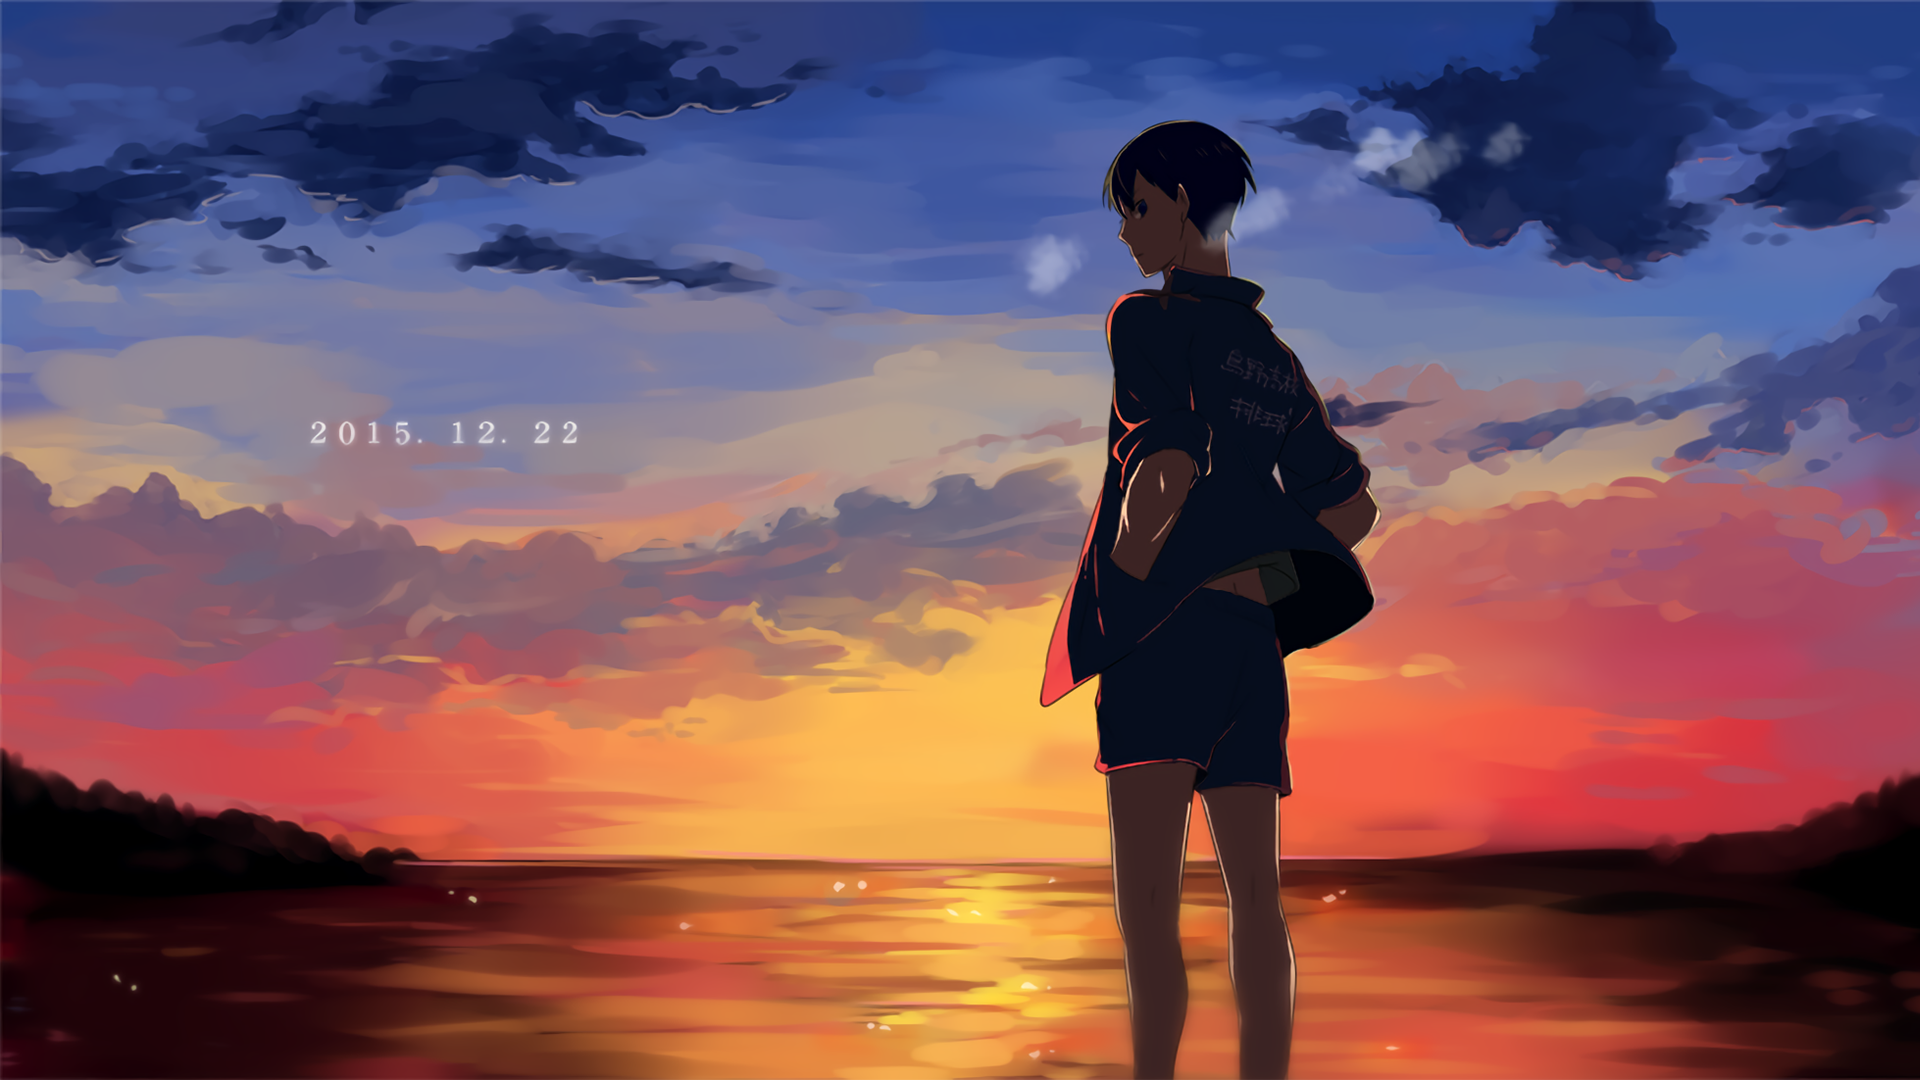 haikyu hd wallpaper background image 1920x1080 id